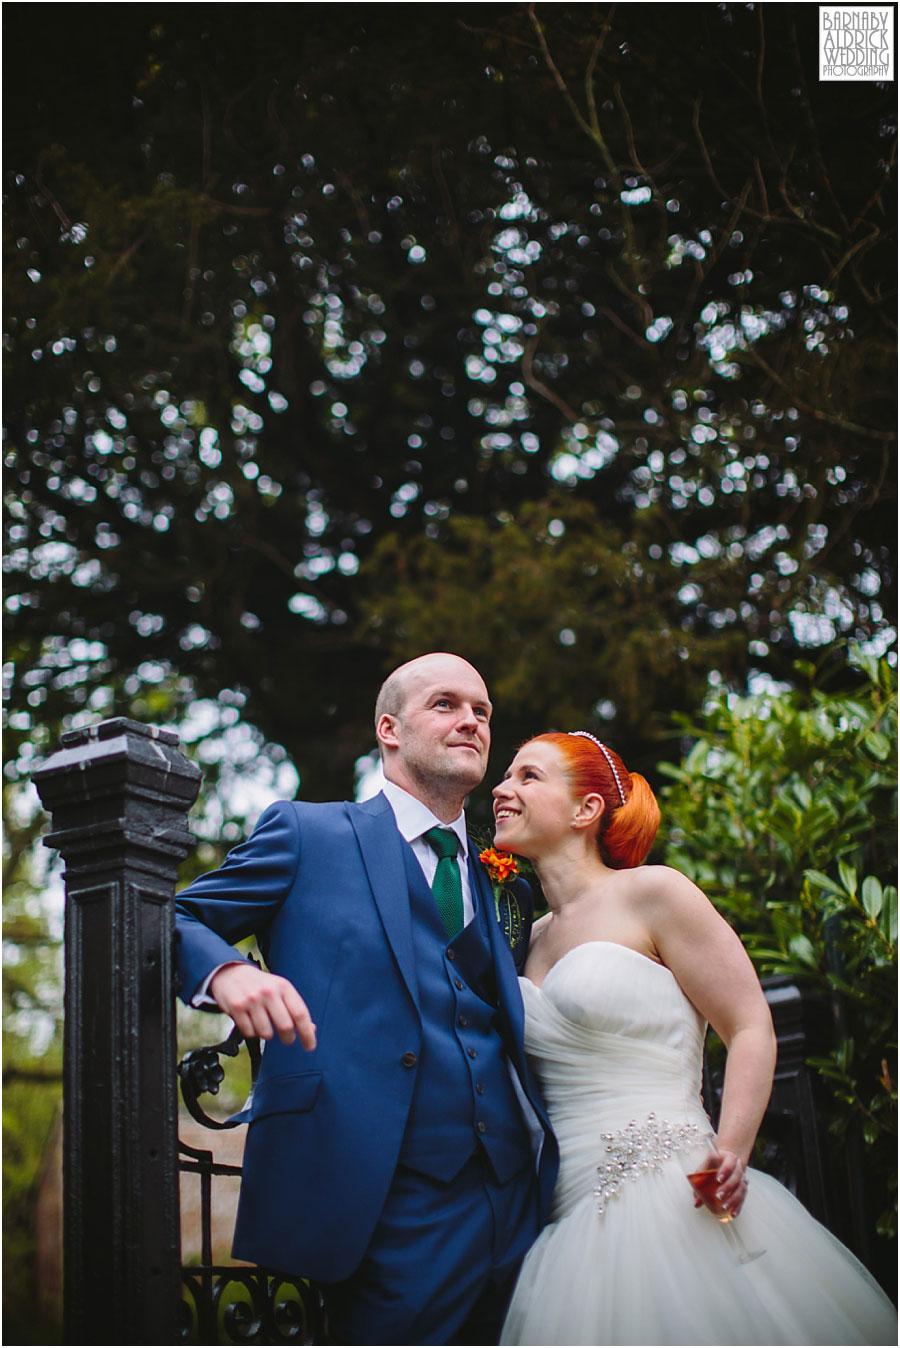 The Old Swan Harrogate Wedding Photography 053.jpg